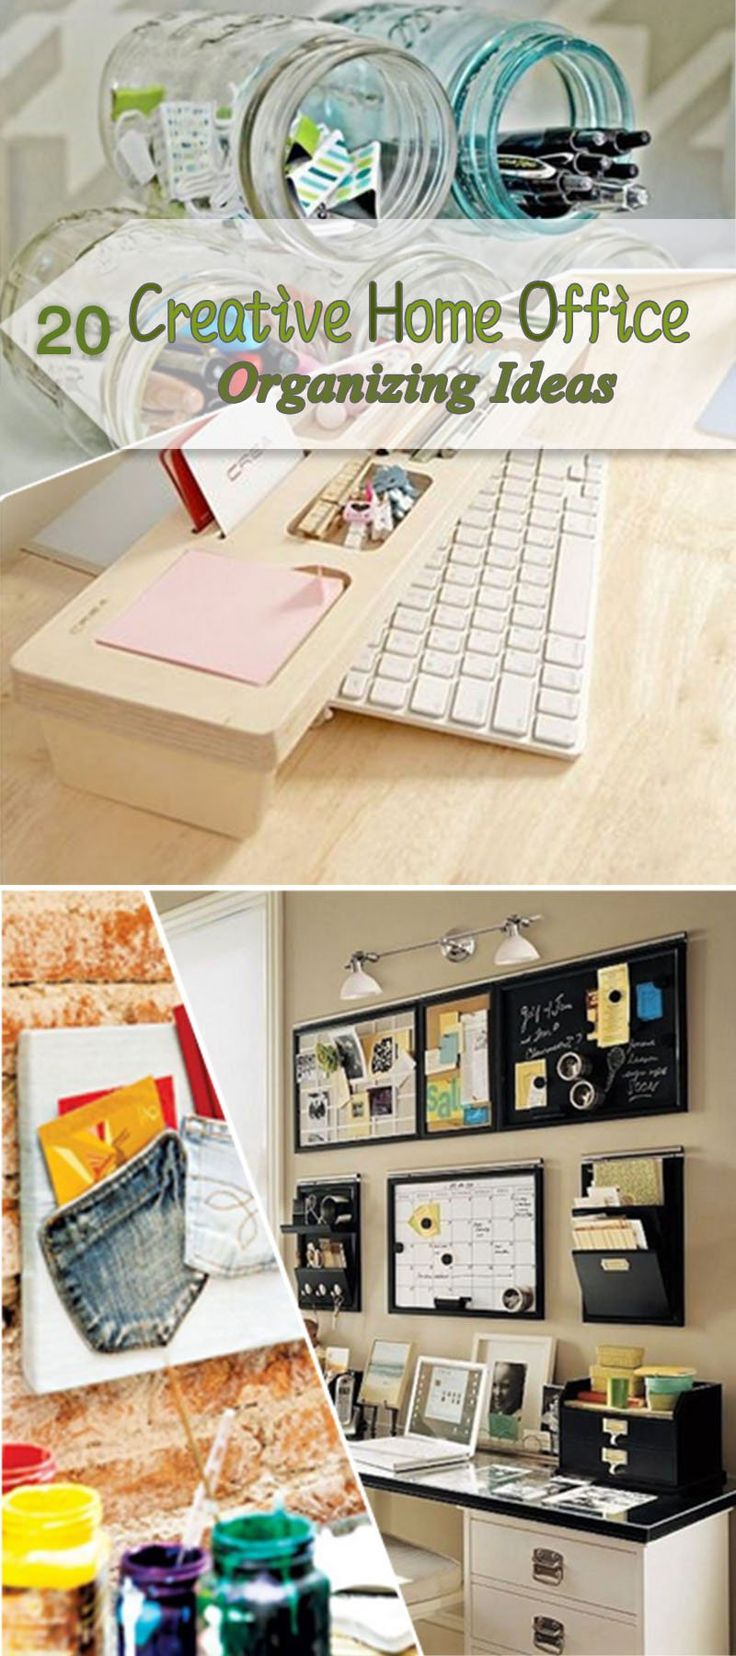 20 Creative Newspaper Craft Fashion Ideas: 20 Creative Home Office Organizing Ideas